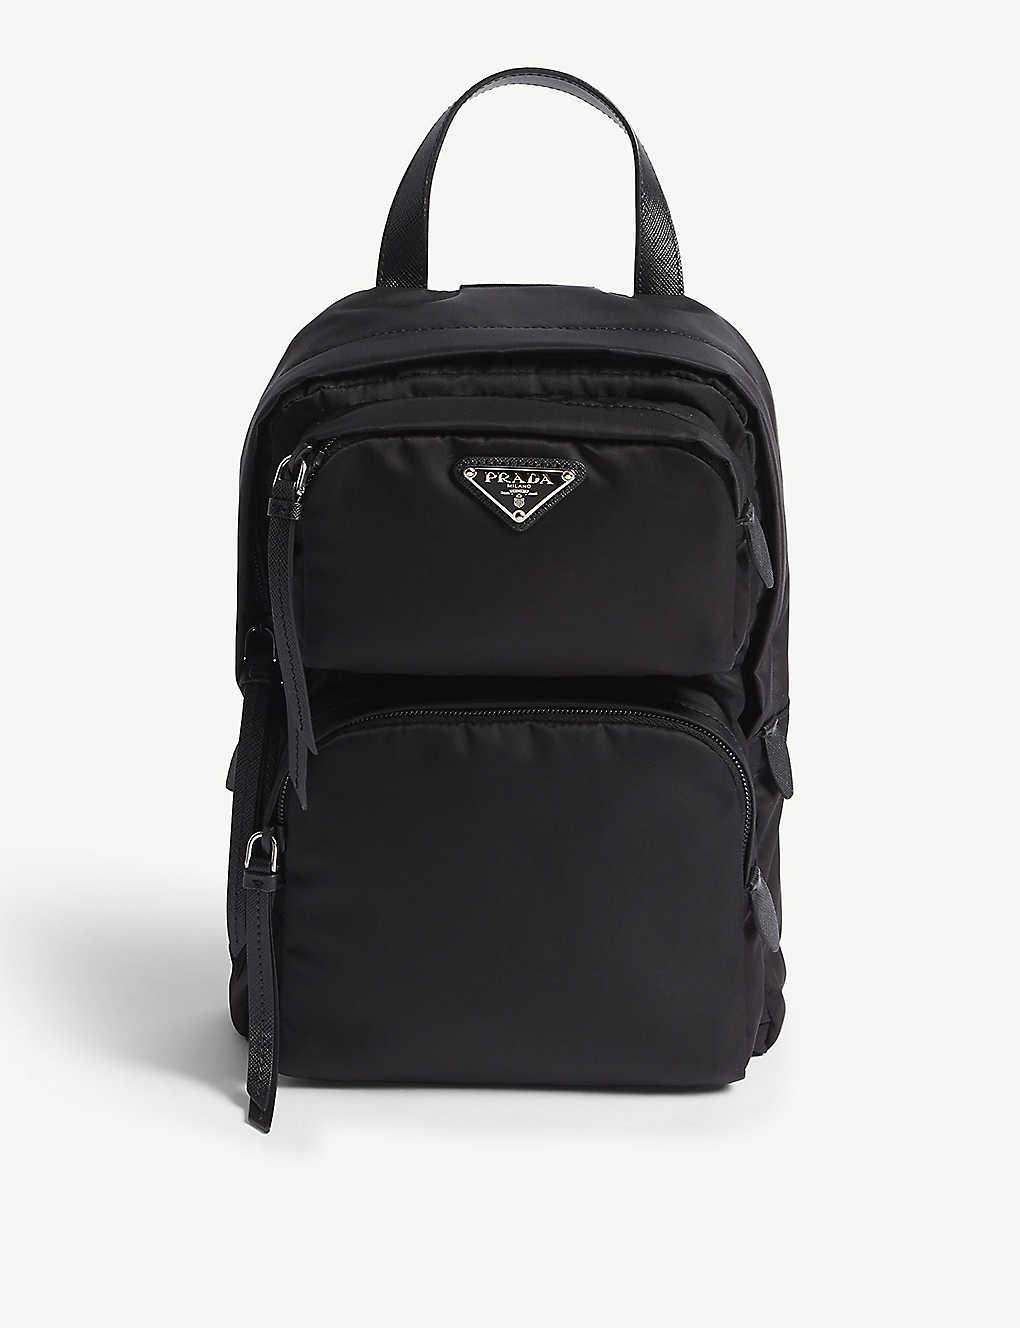 6db5b2a3008413 PRADA - One-shoulder nylon backpack   Selfridges.com